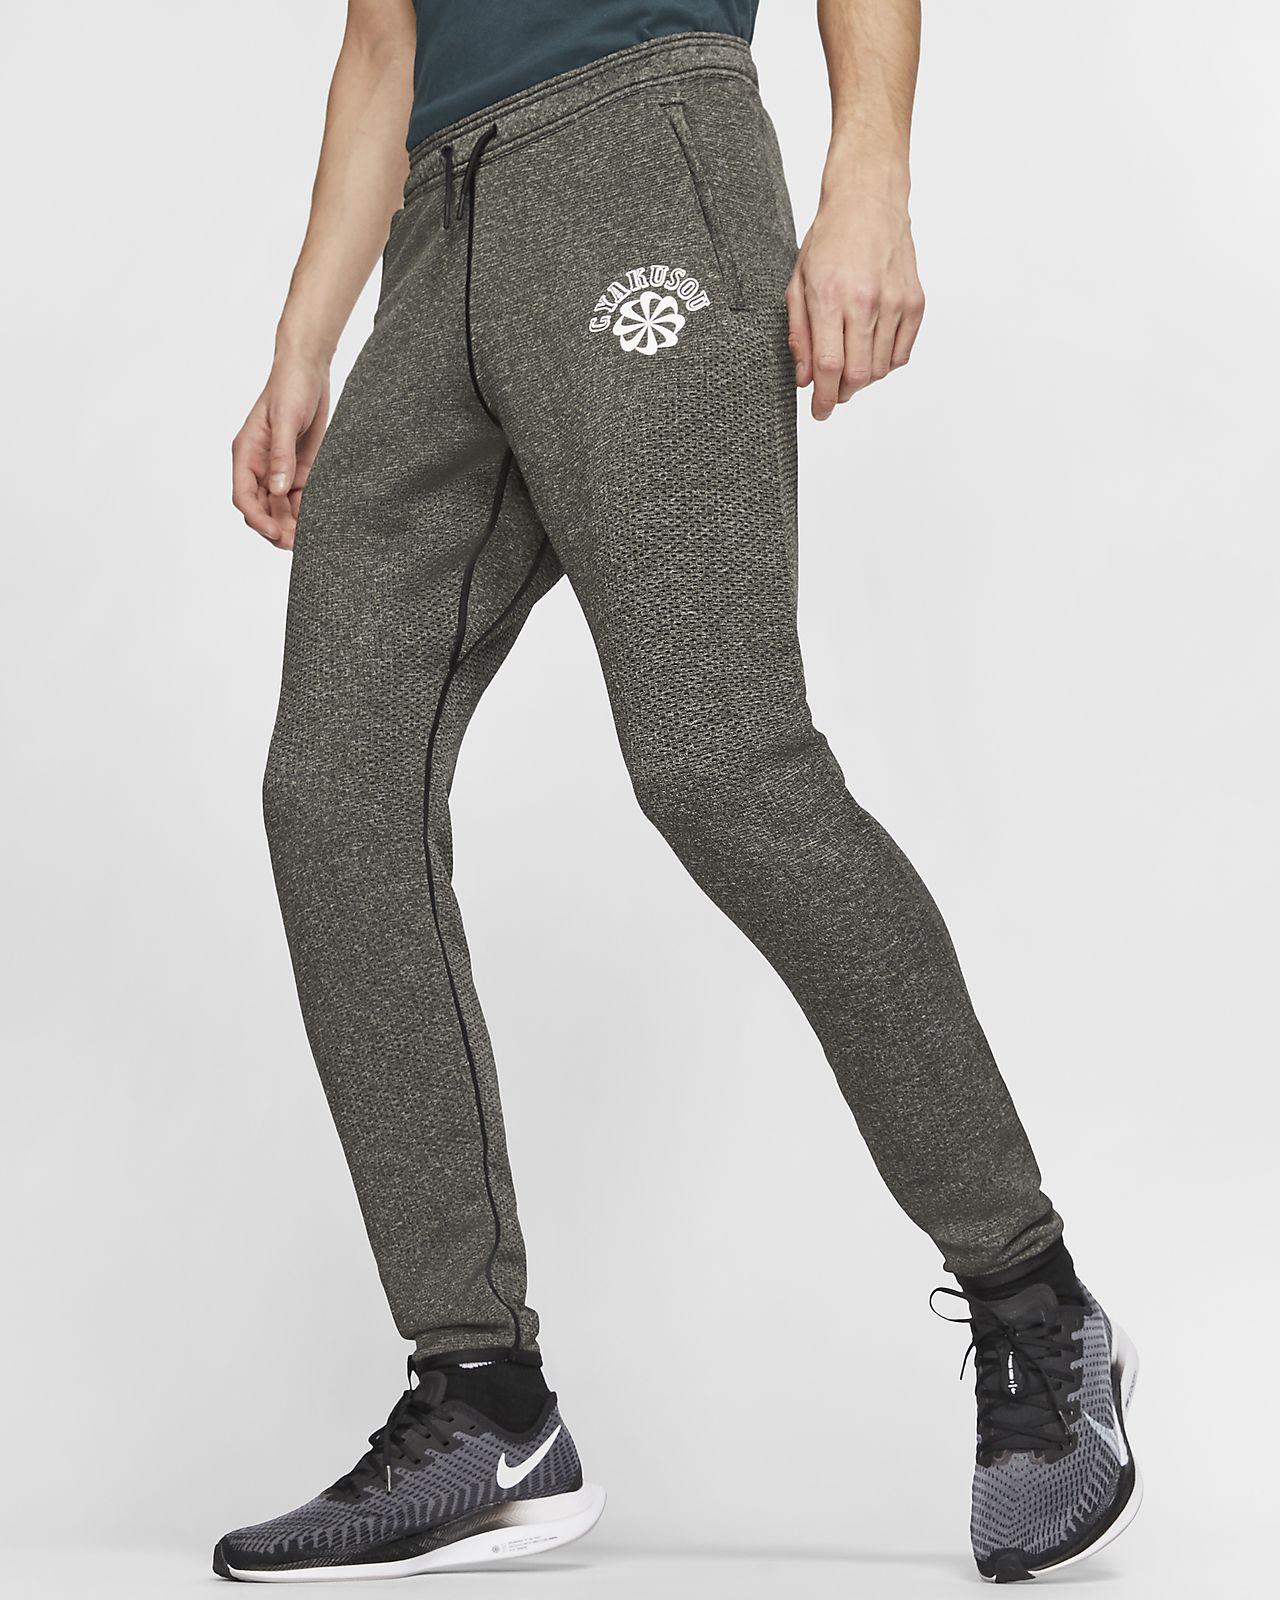 Nike x Gyakusou Knit Pants